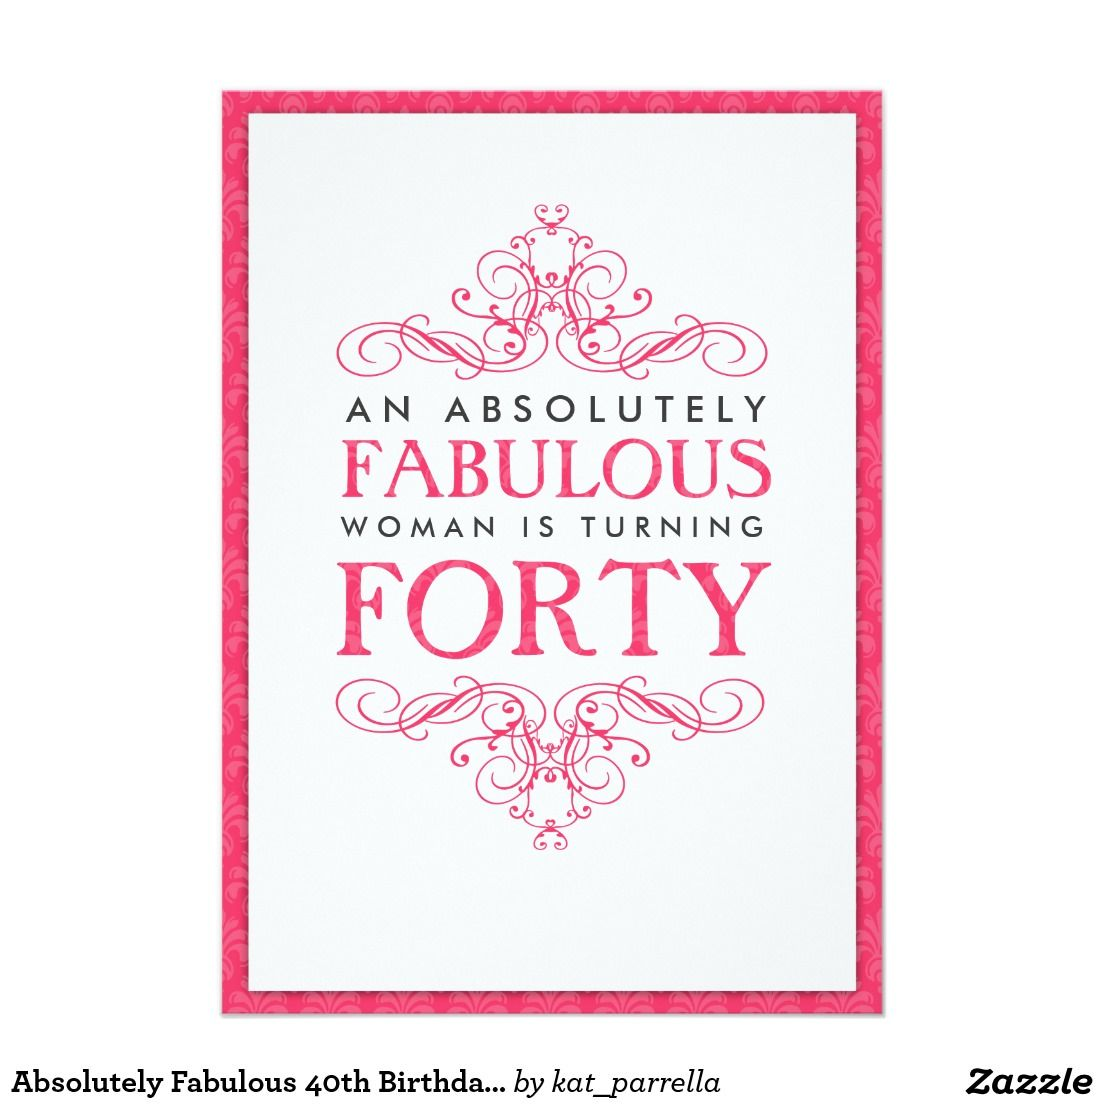 Absolutely Fabulous 40th Birthday Party Invitation | Birthday ...